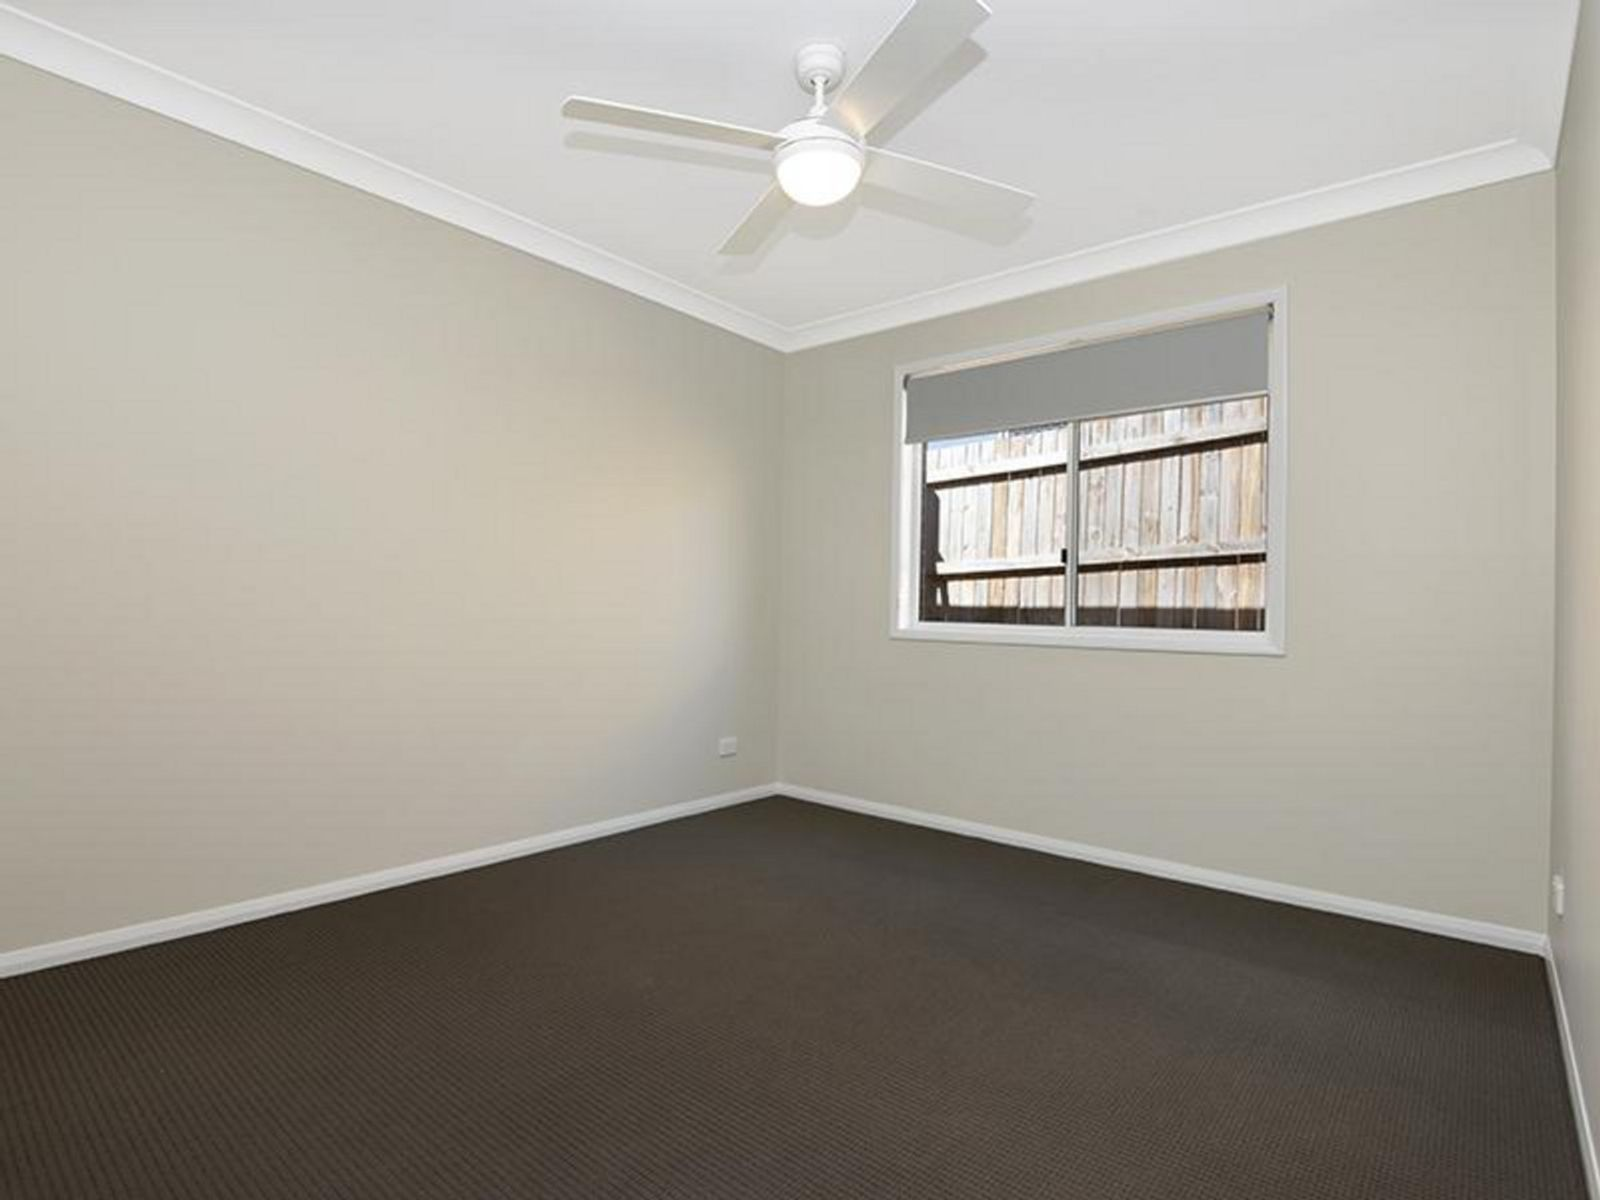 4/24 Dalmeny Street, Wilsonton, QLD 4350